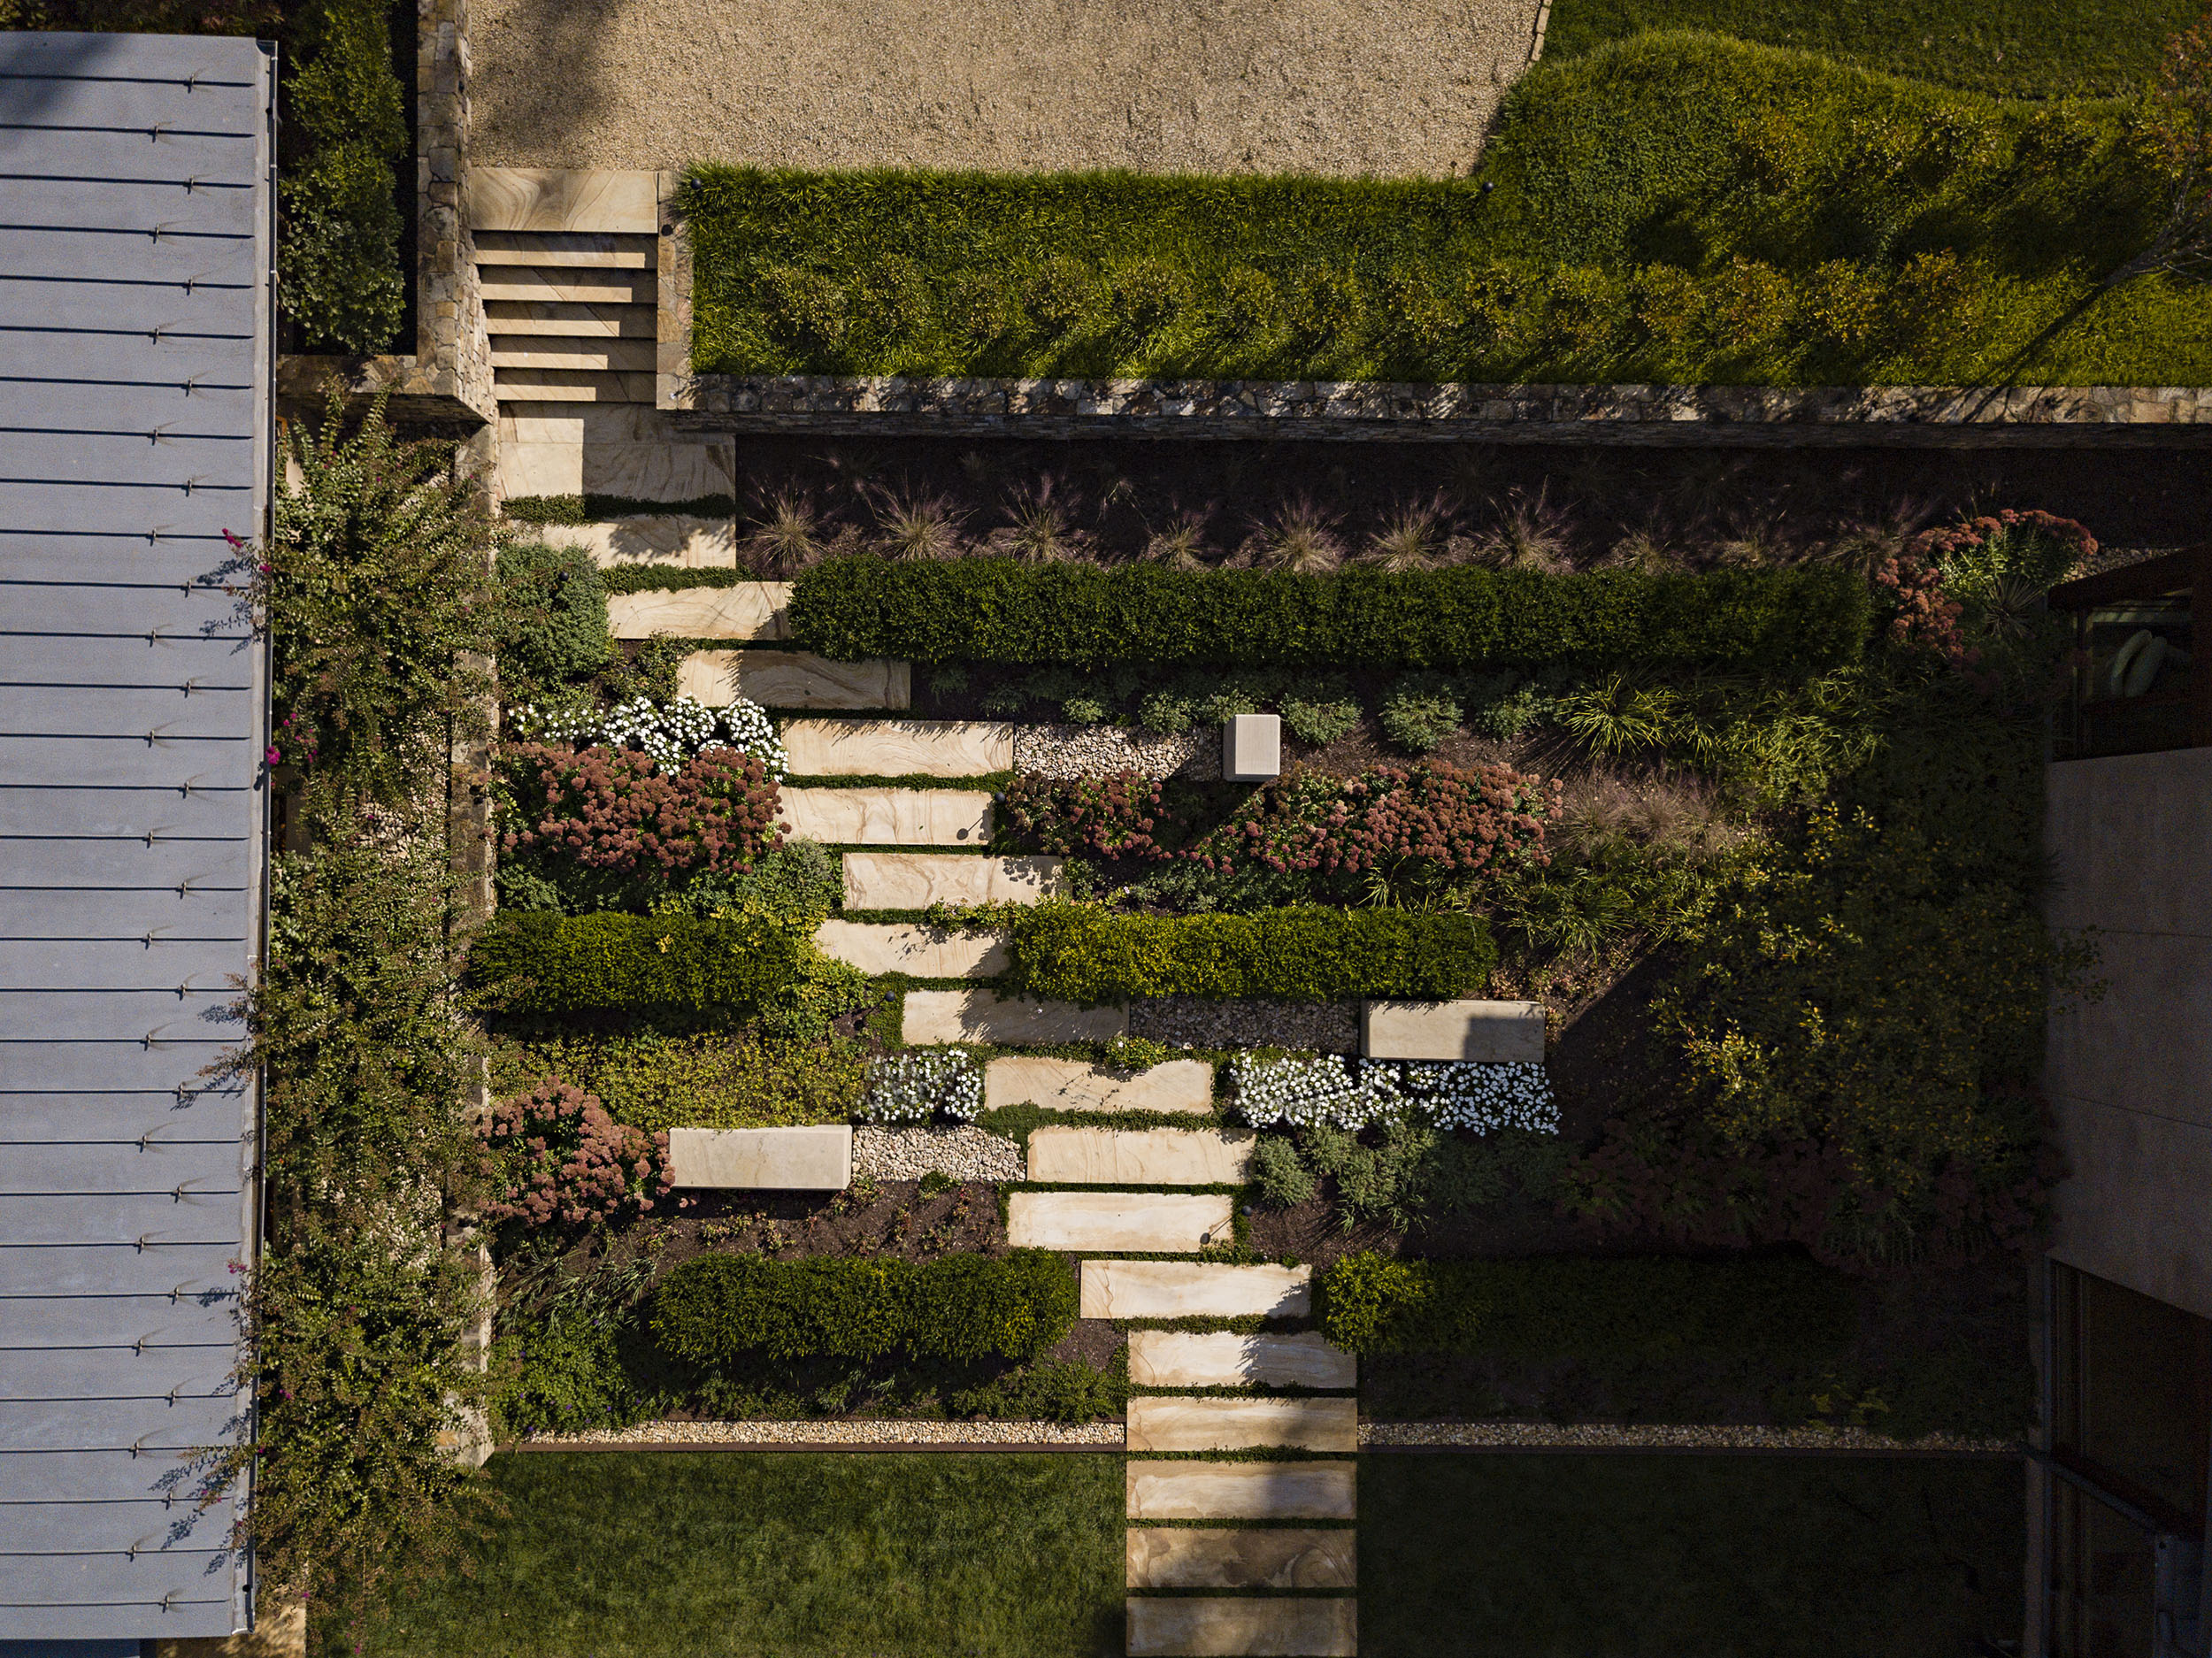 Grounded-sandstone-modern-landcape-architecture_charlottesville-planting2.jpg